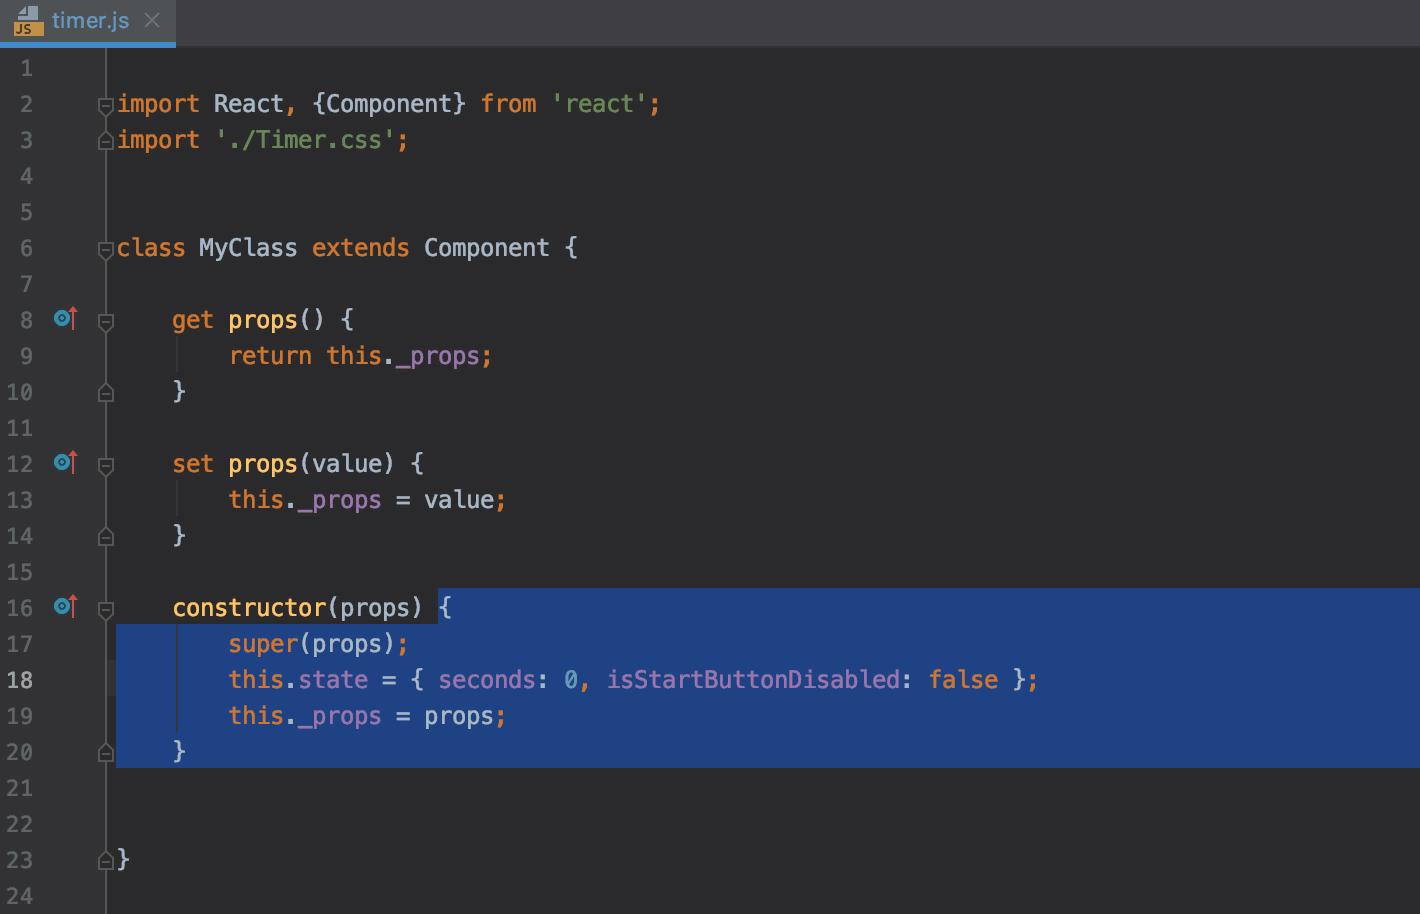 Code selection